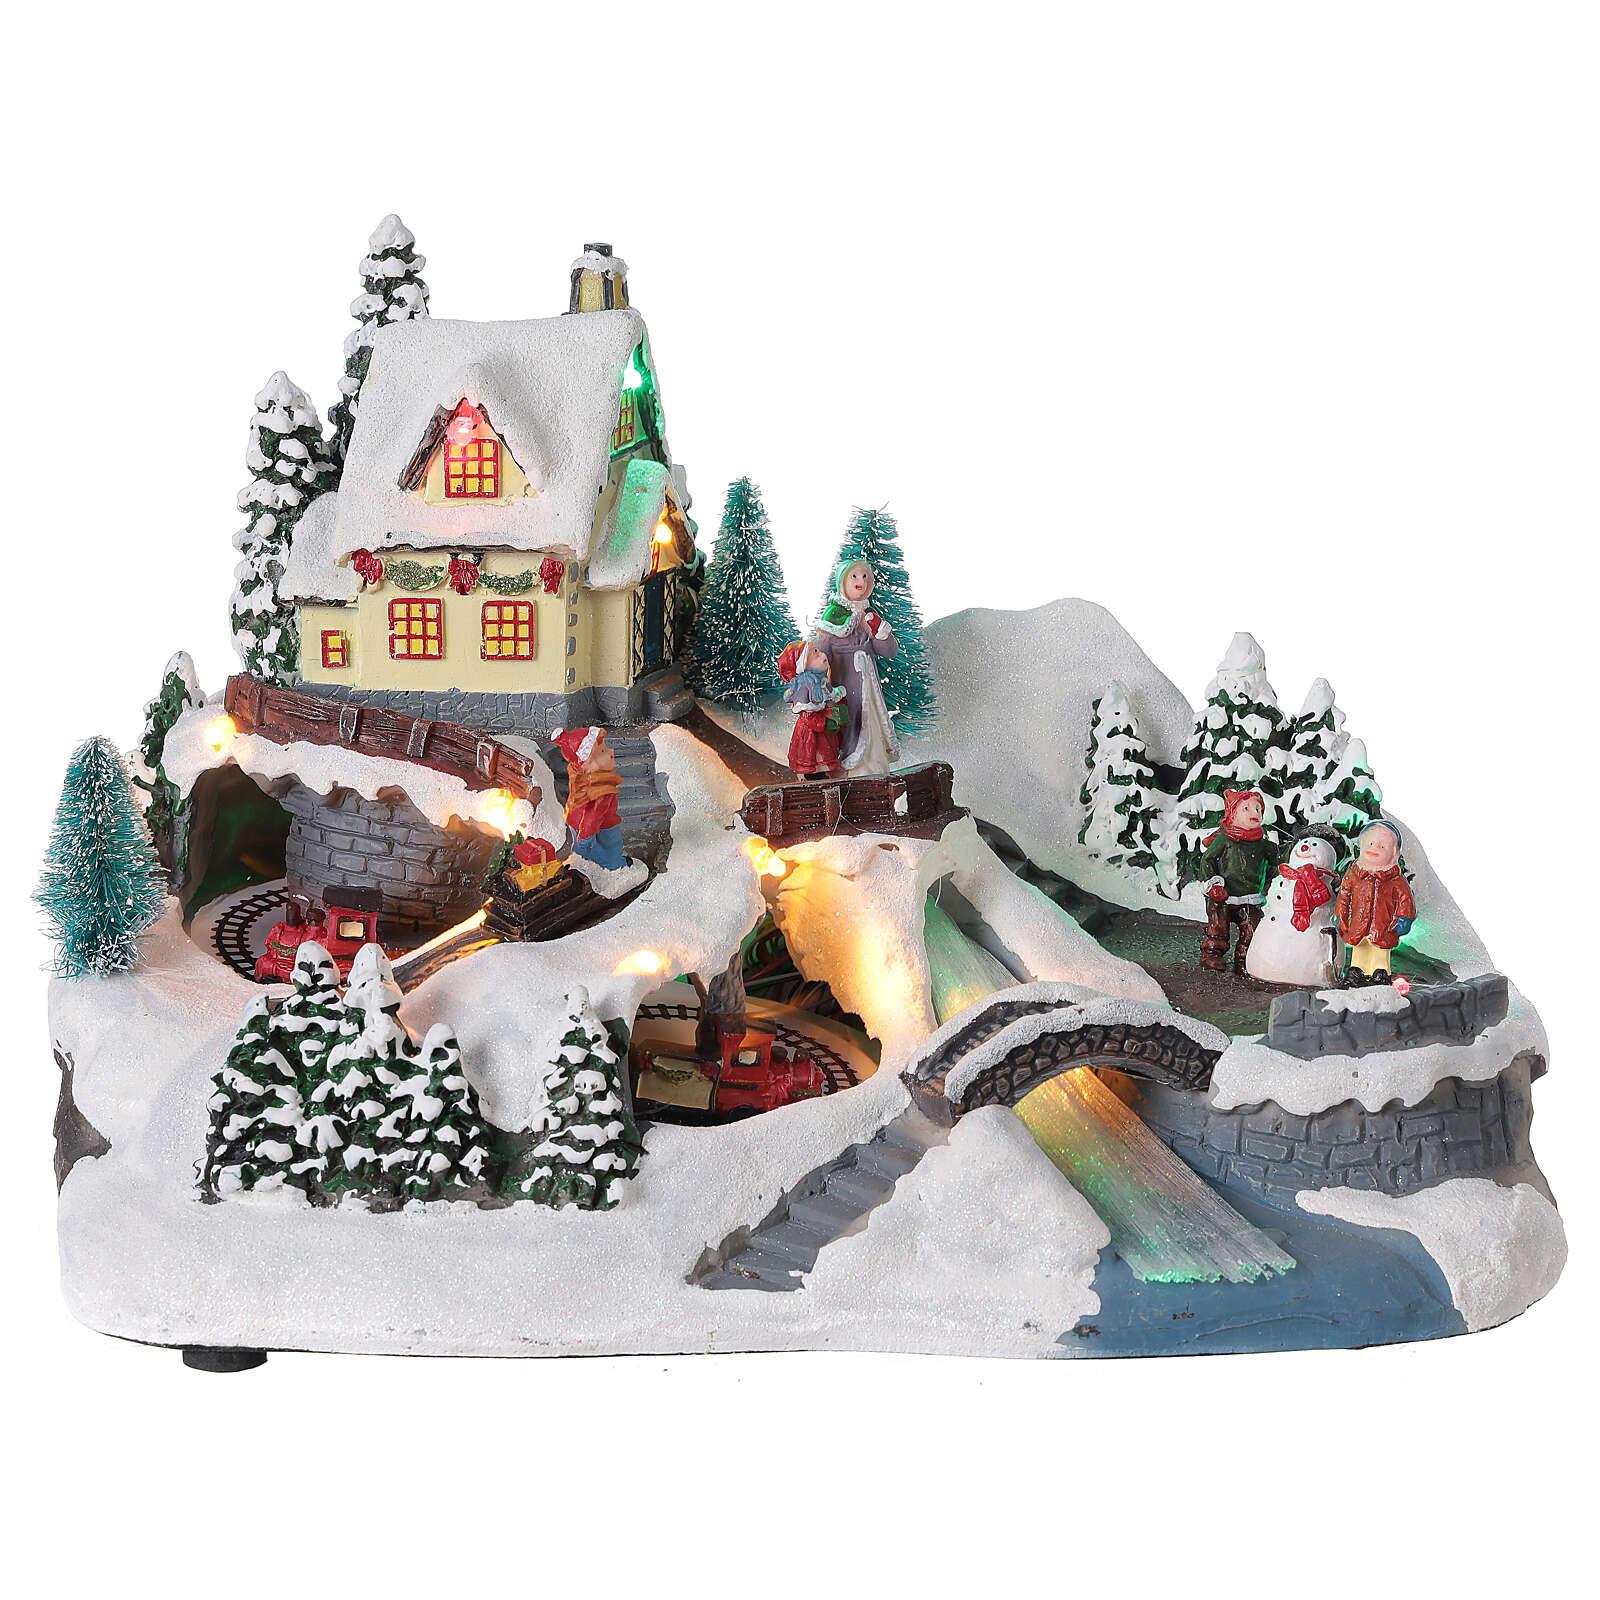 Lighted Christmas village train river music 20x30x20 cm 3